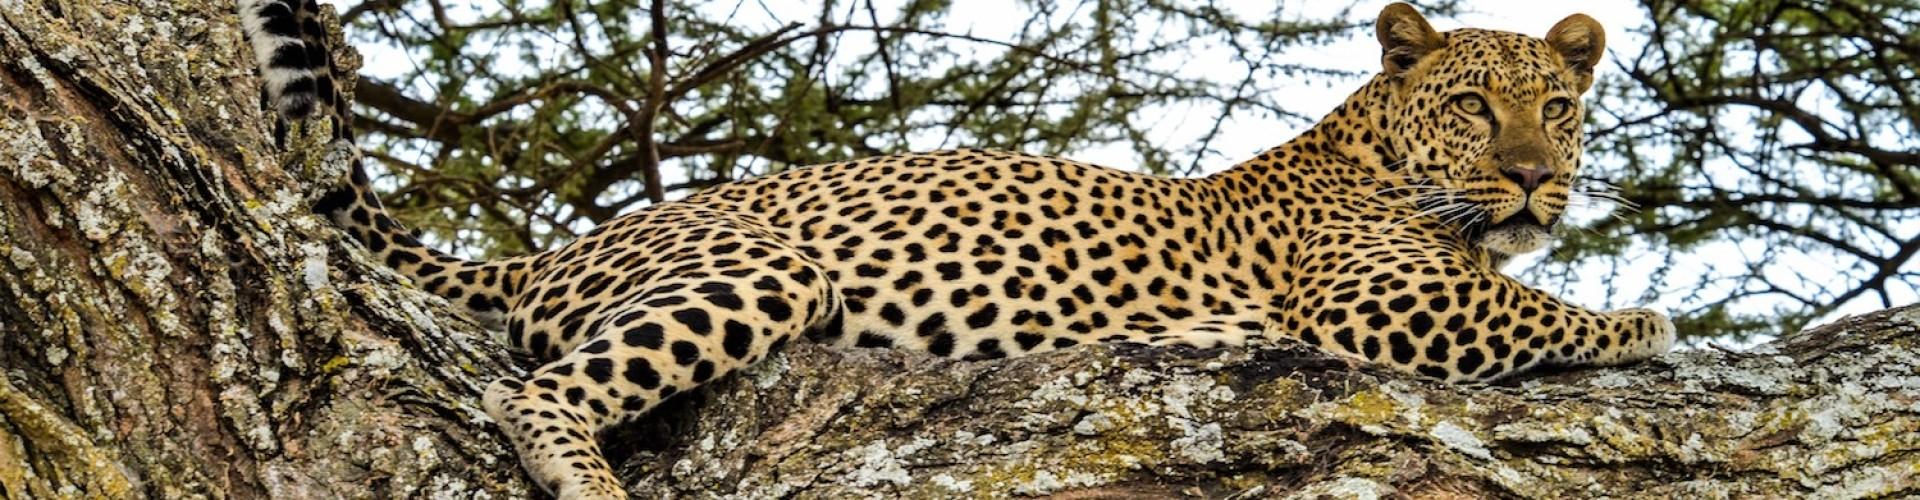 Tanzania Afrika Vakantie